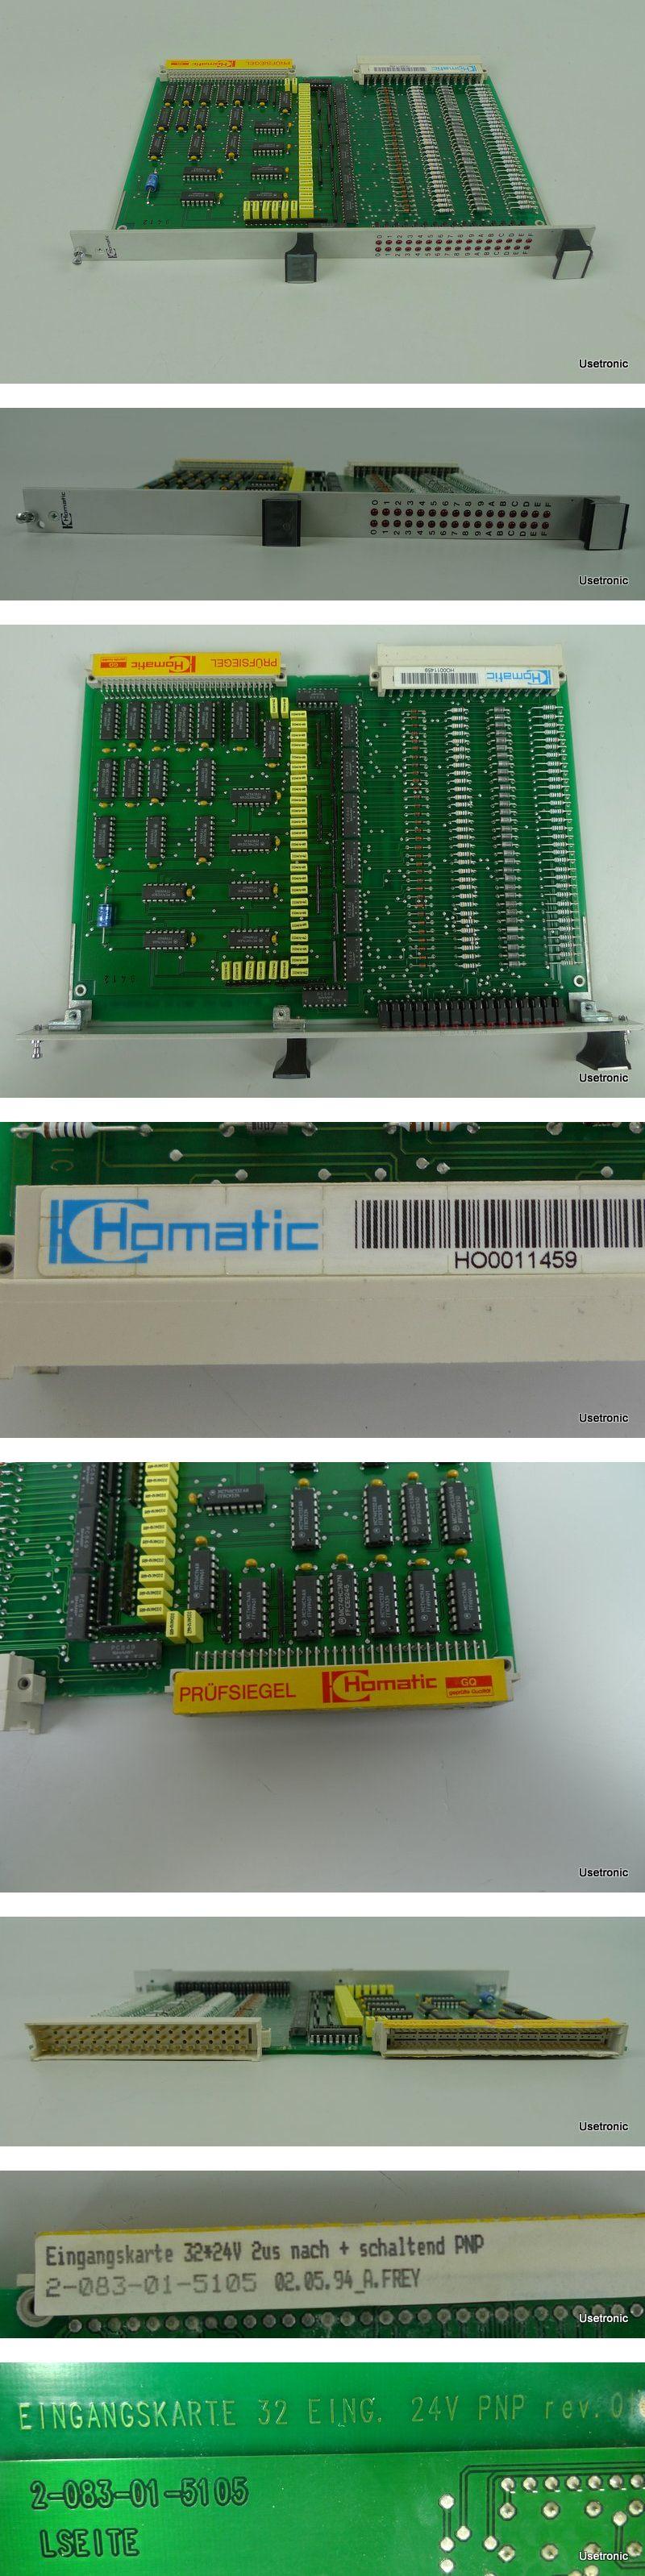 Homatic 2-083-01-5105